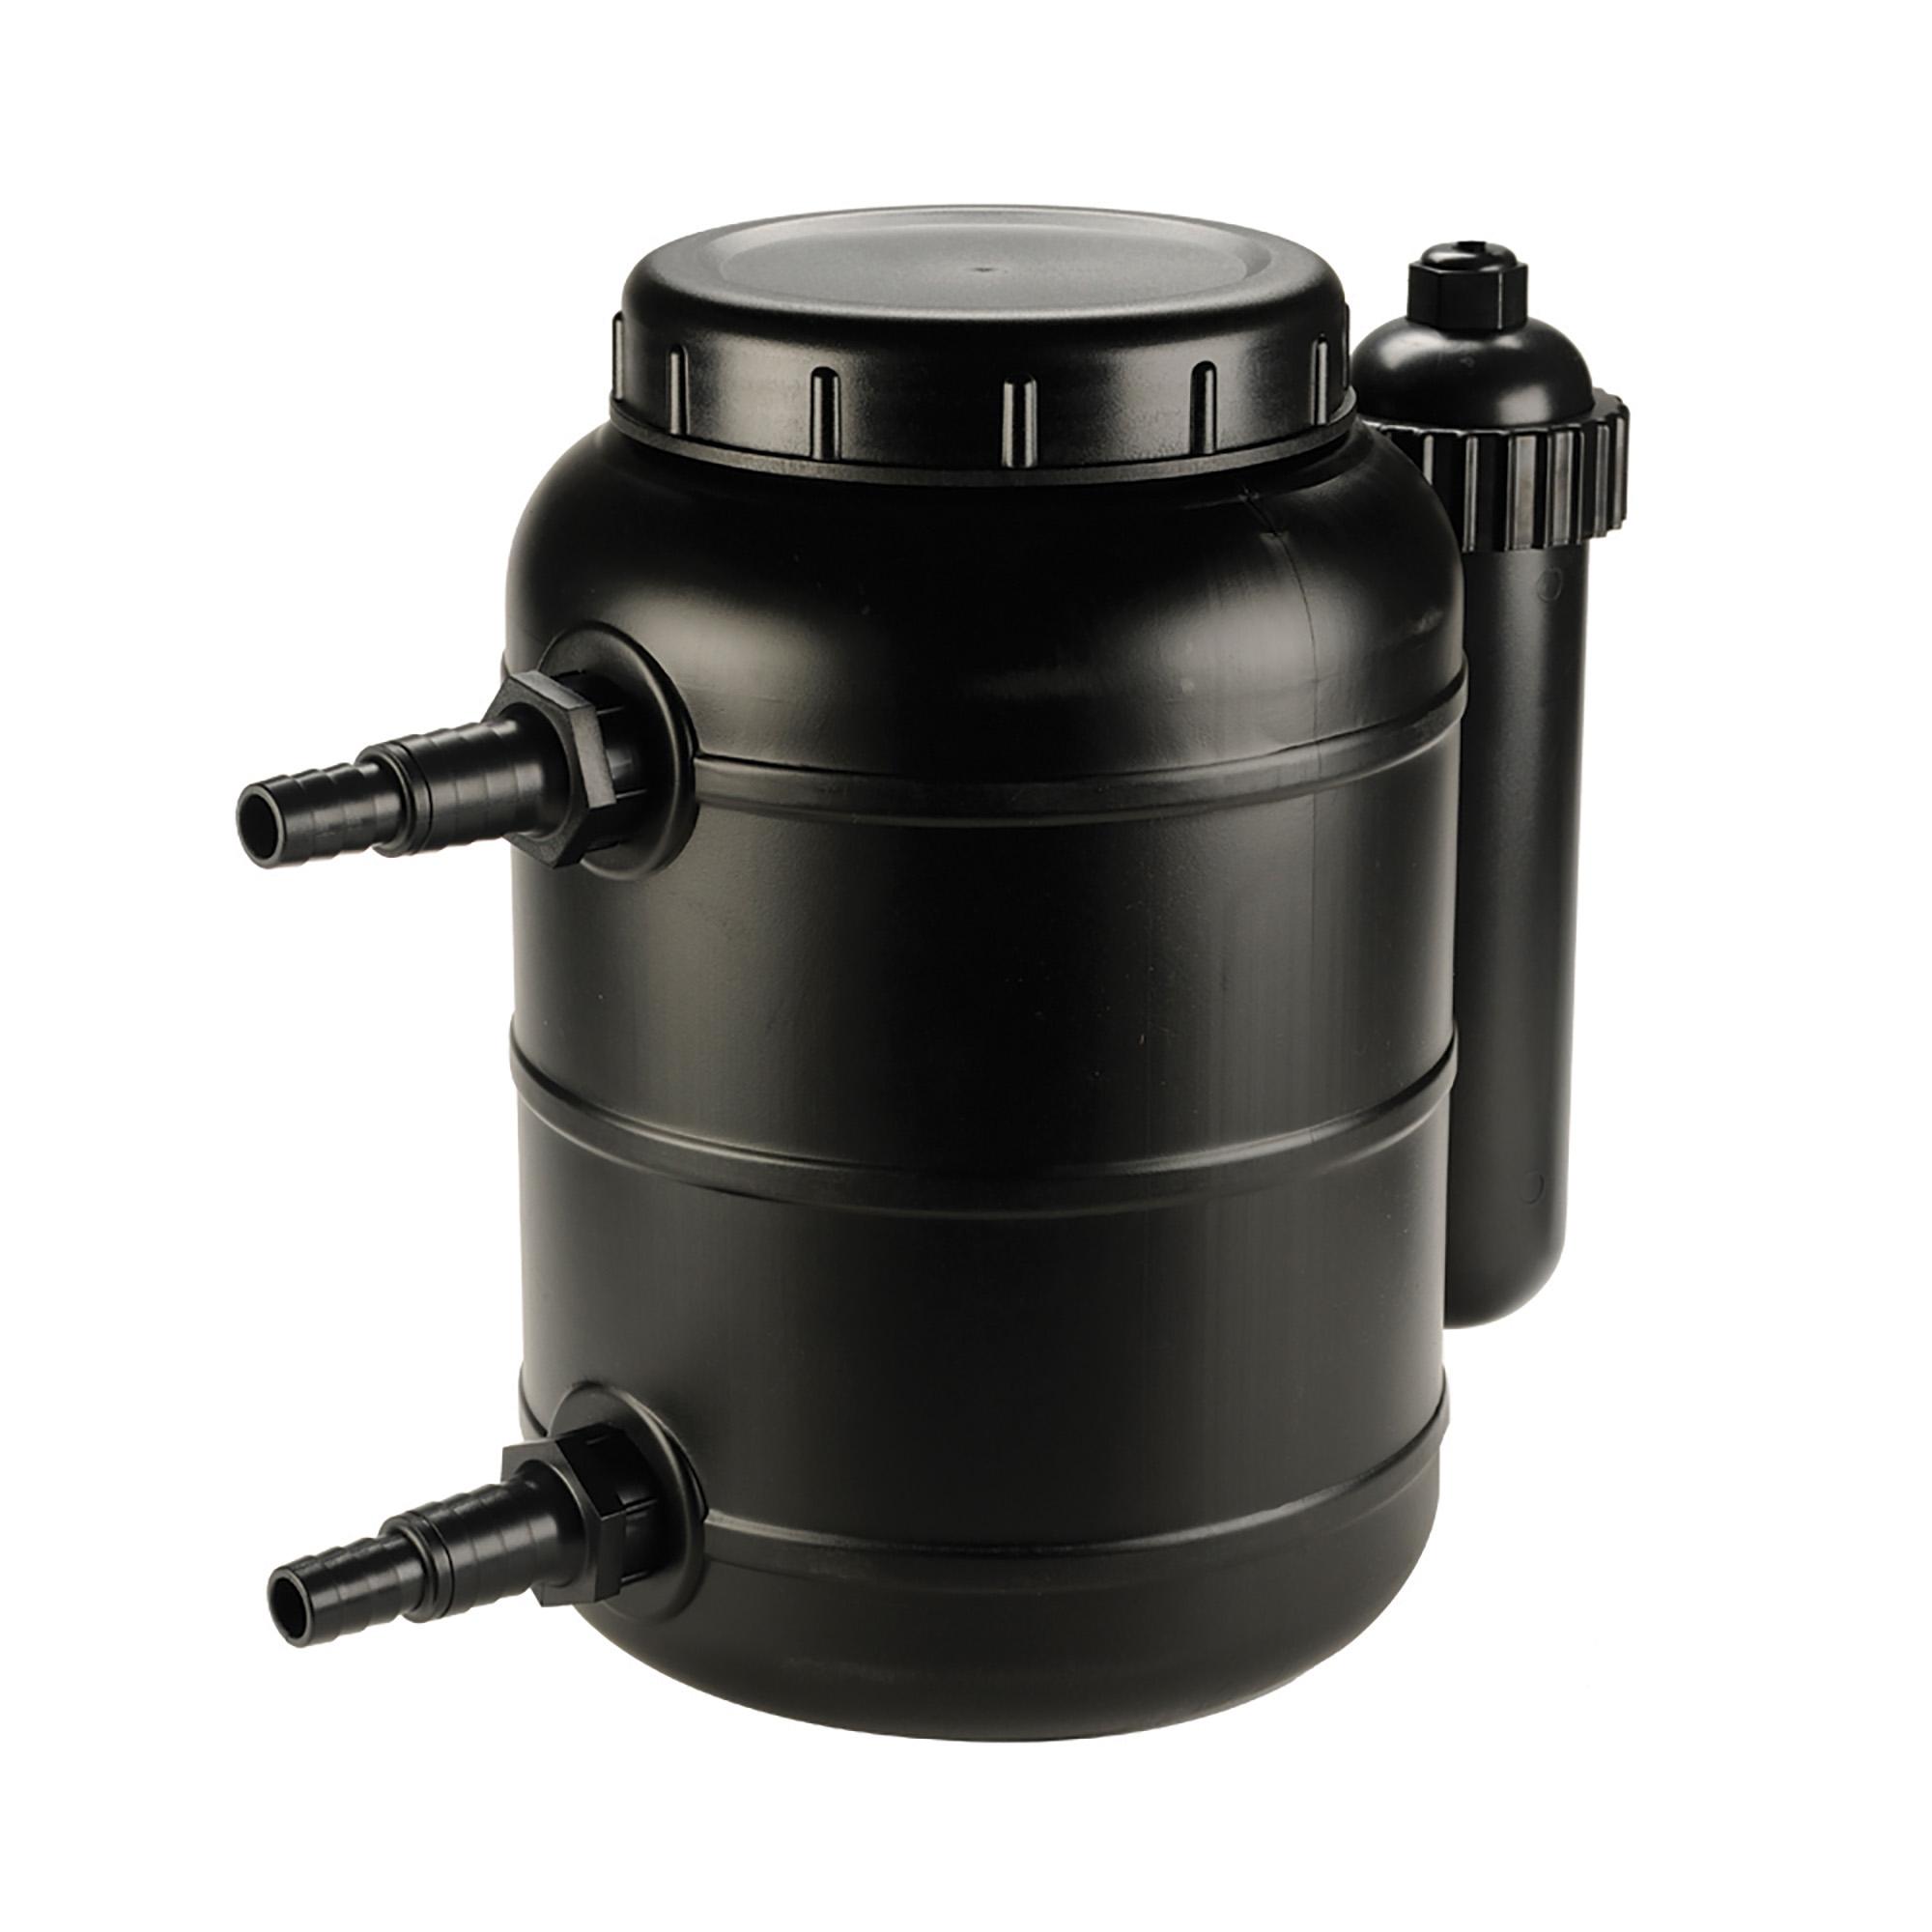 Pressurized Pond Filter with UV